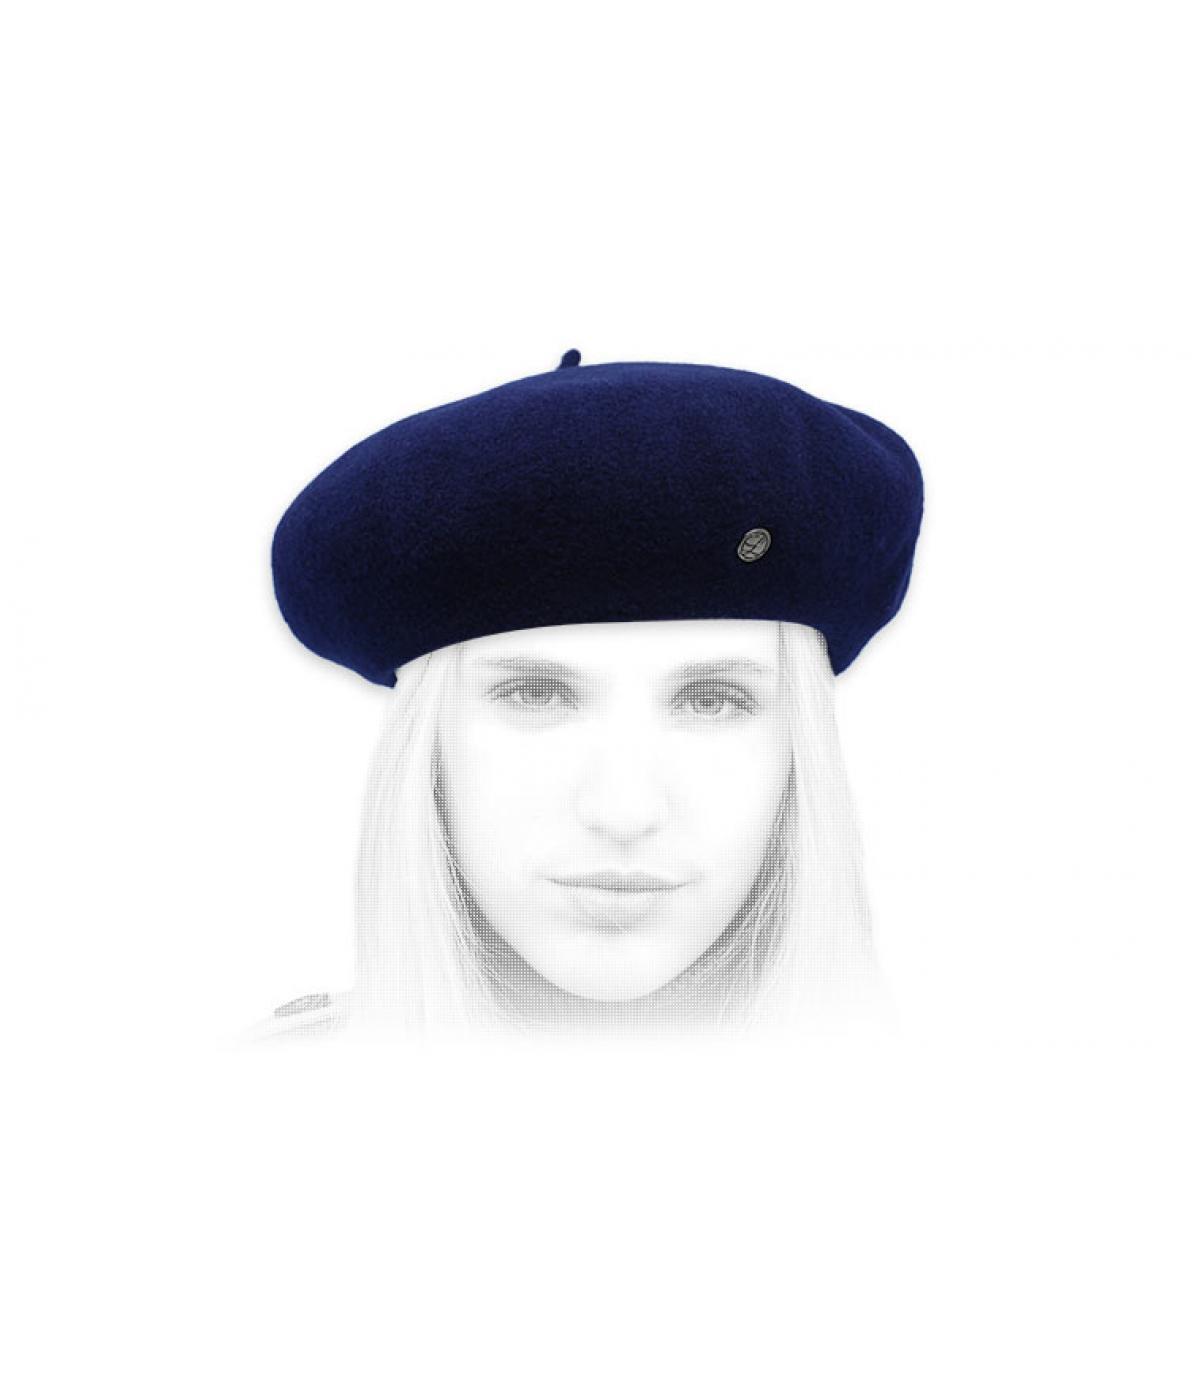 navy blue cashmere beret